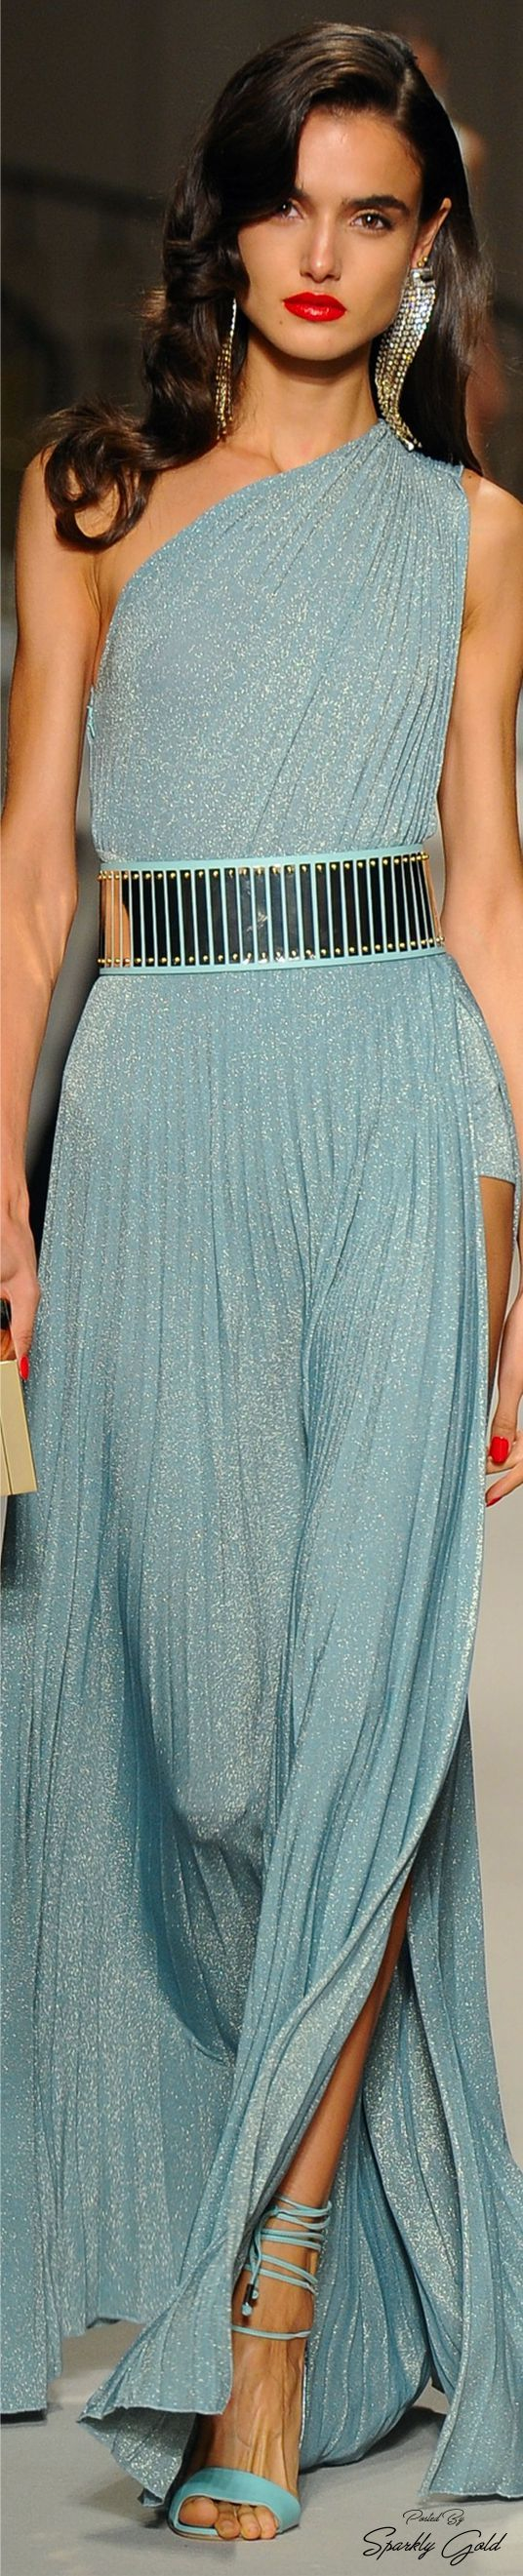 Rosamaria G Frangini | High Fashion Details | cfg | Elisabetta Franchi Spring 2017 RTW